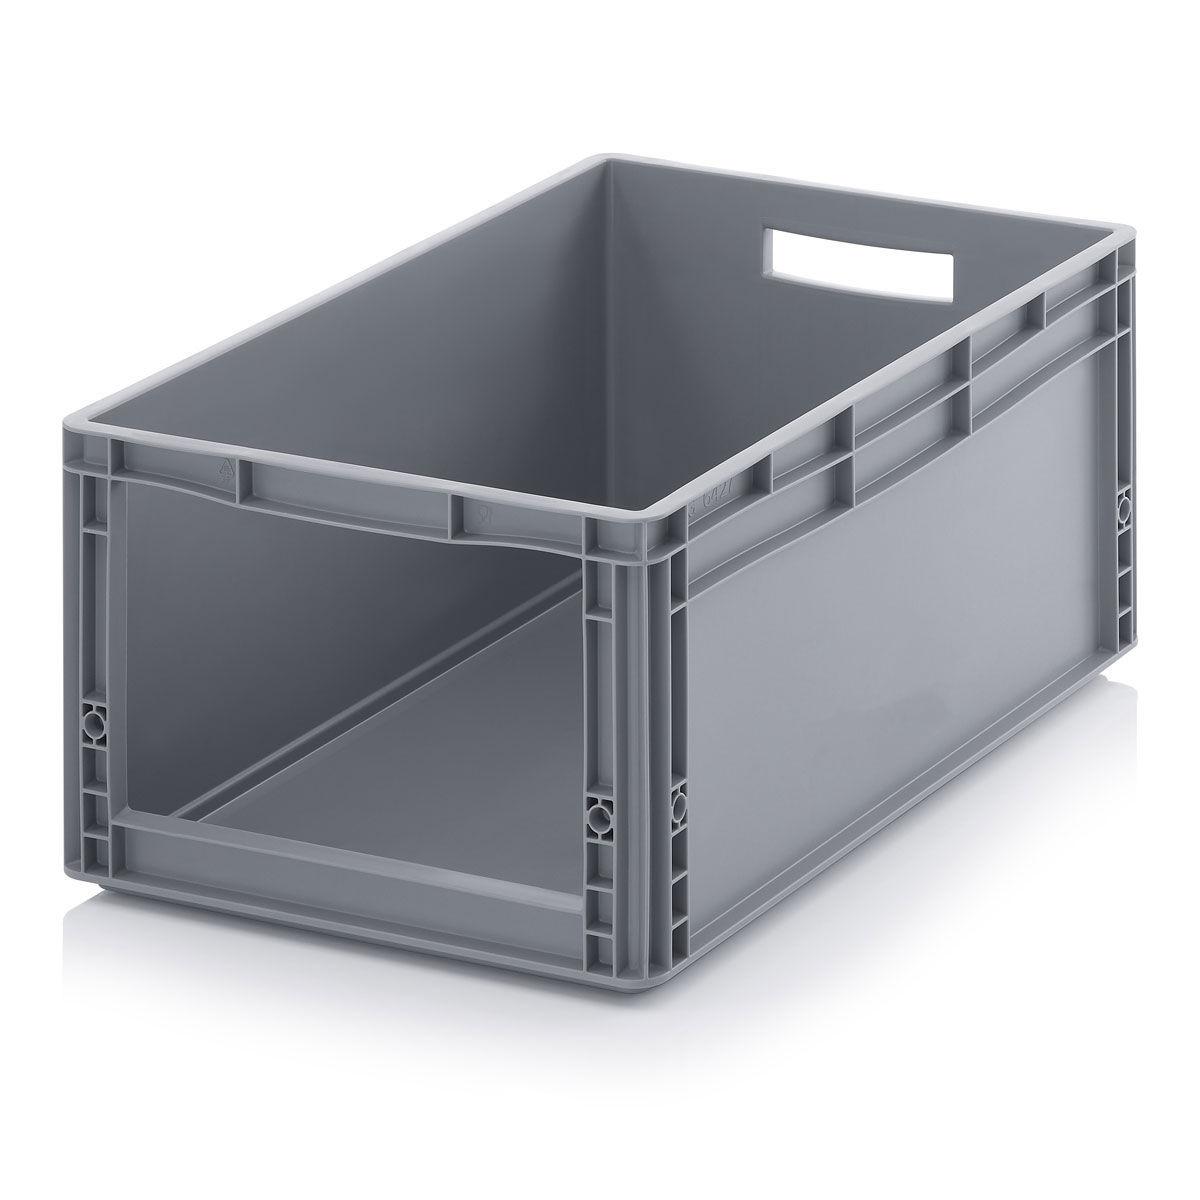 Cajas de pl stico apilables con tapa cajas de pl stico - Cajas apilables de plastico ...